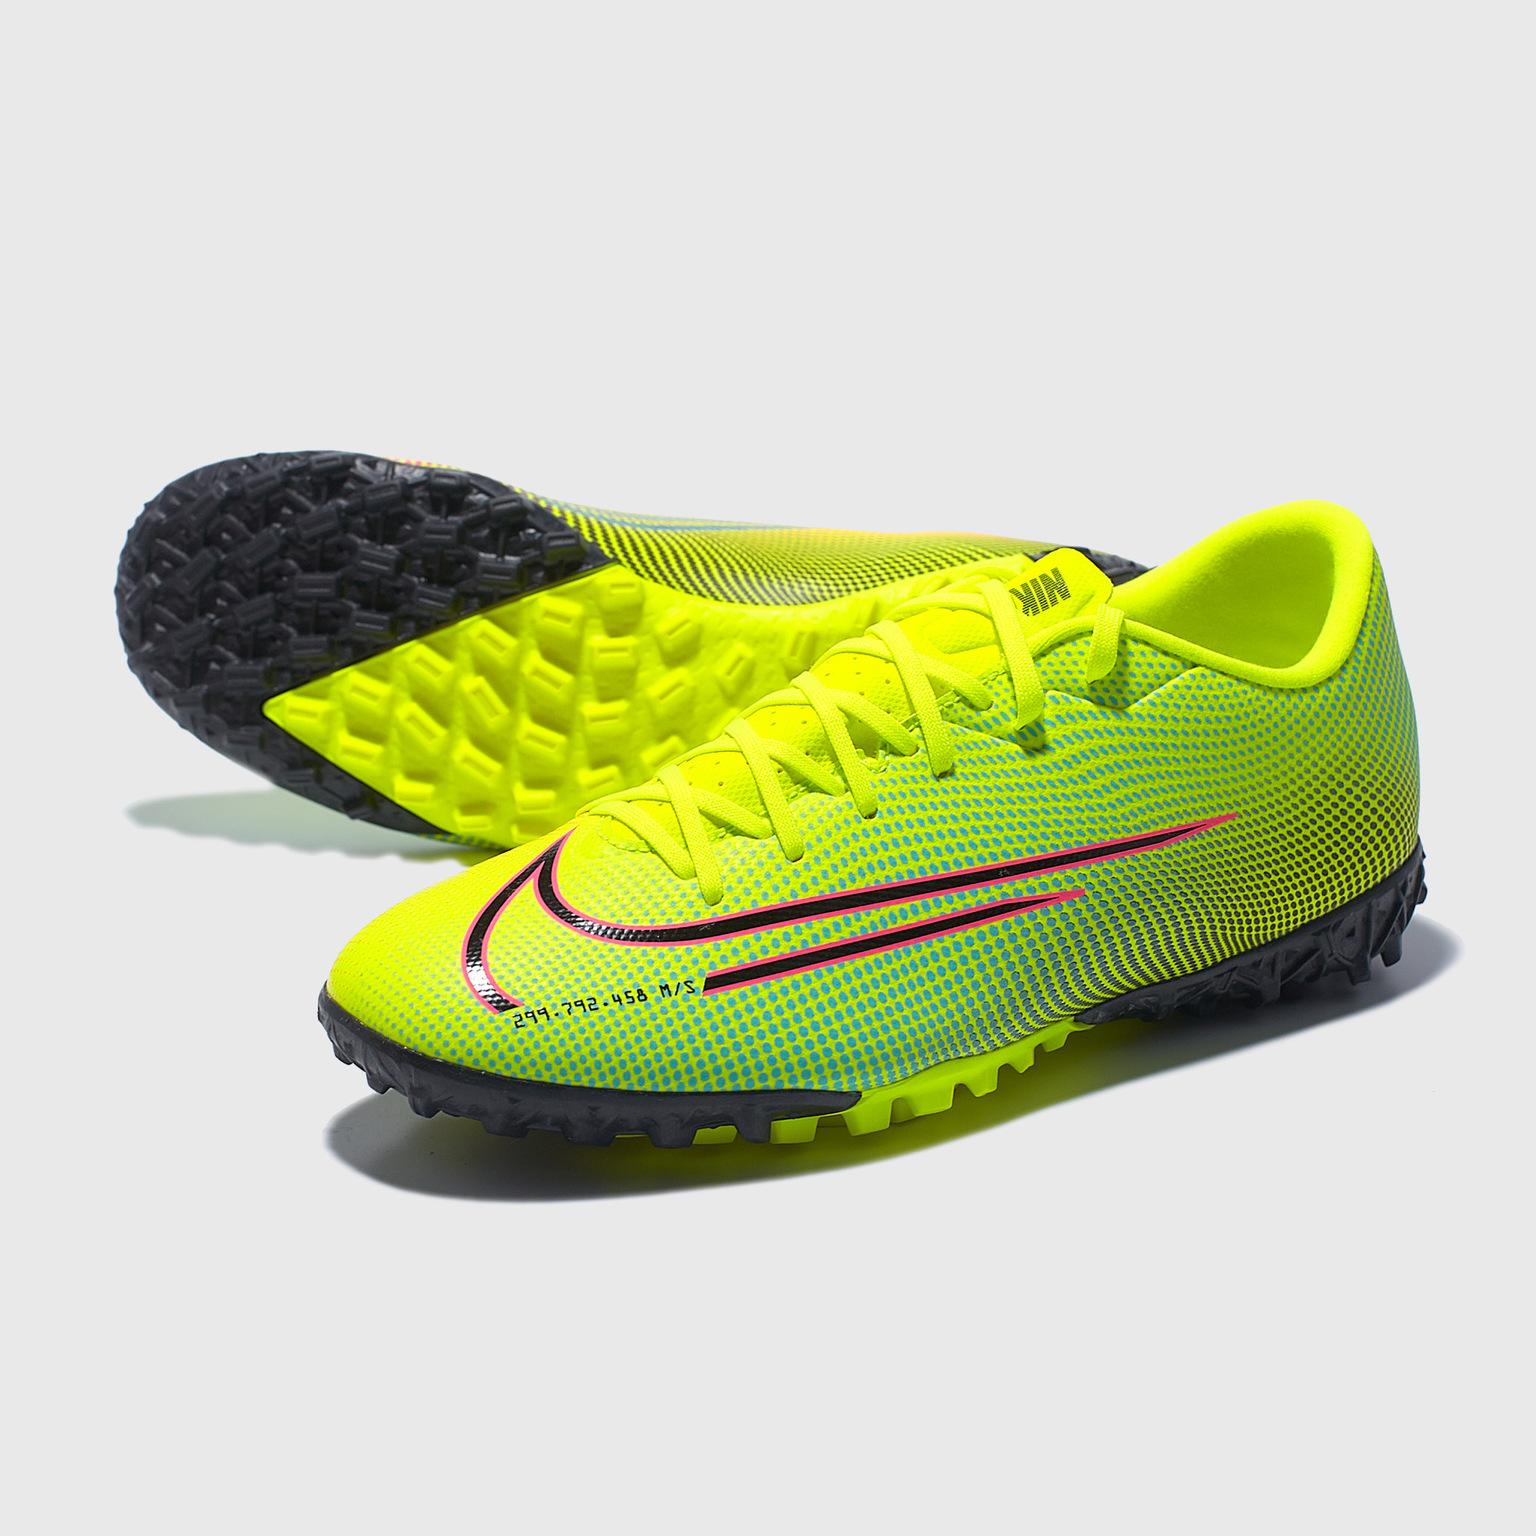 Фото - Шиповки Nike Vapor 13 Academy MDS TF CJ1306-703 шиповки детские nike vapor 13 academy neymar tf at8144 104